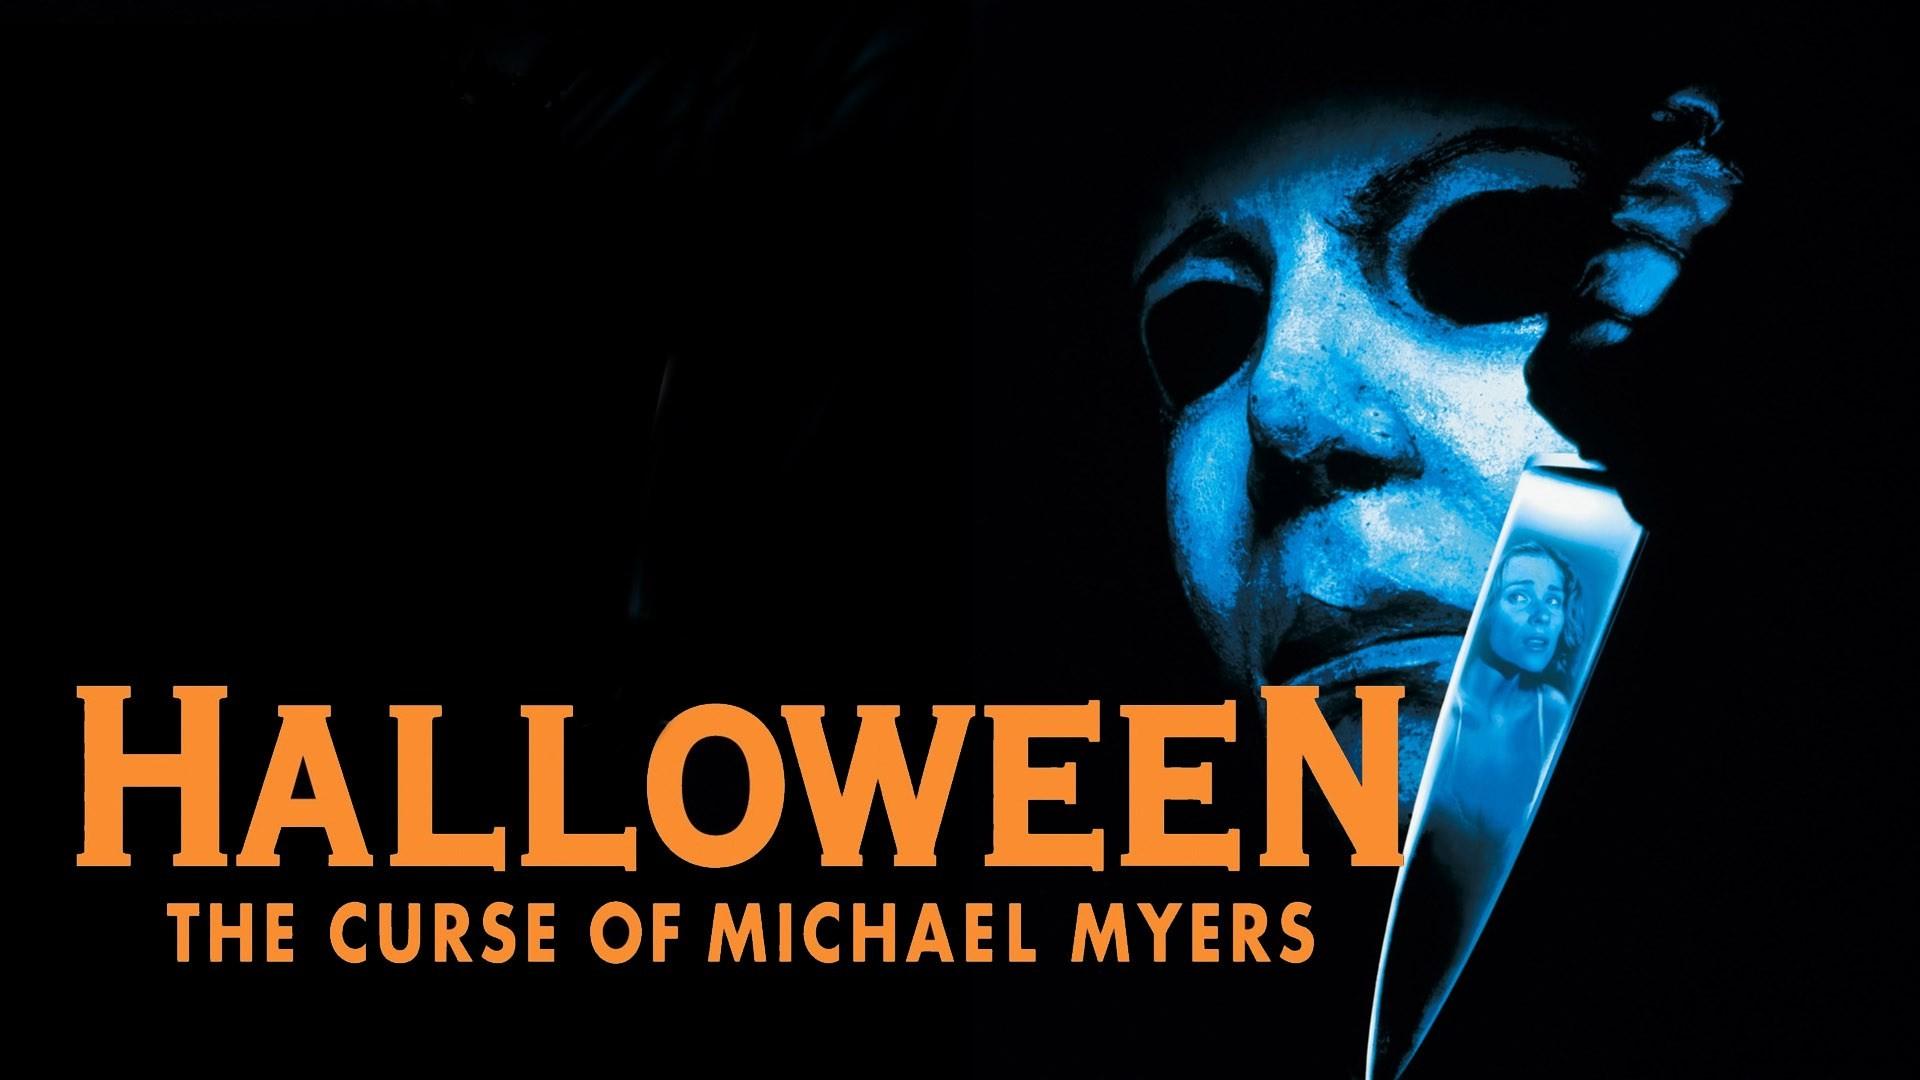 Halloween Michael Myers Wallpaper 80 Images